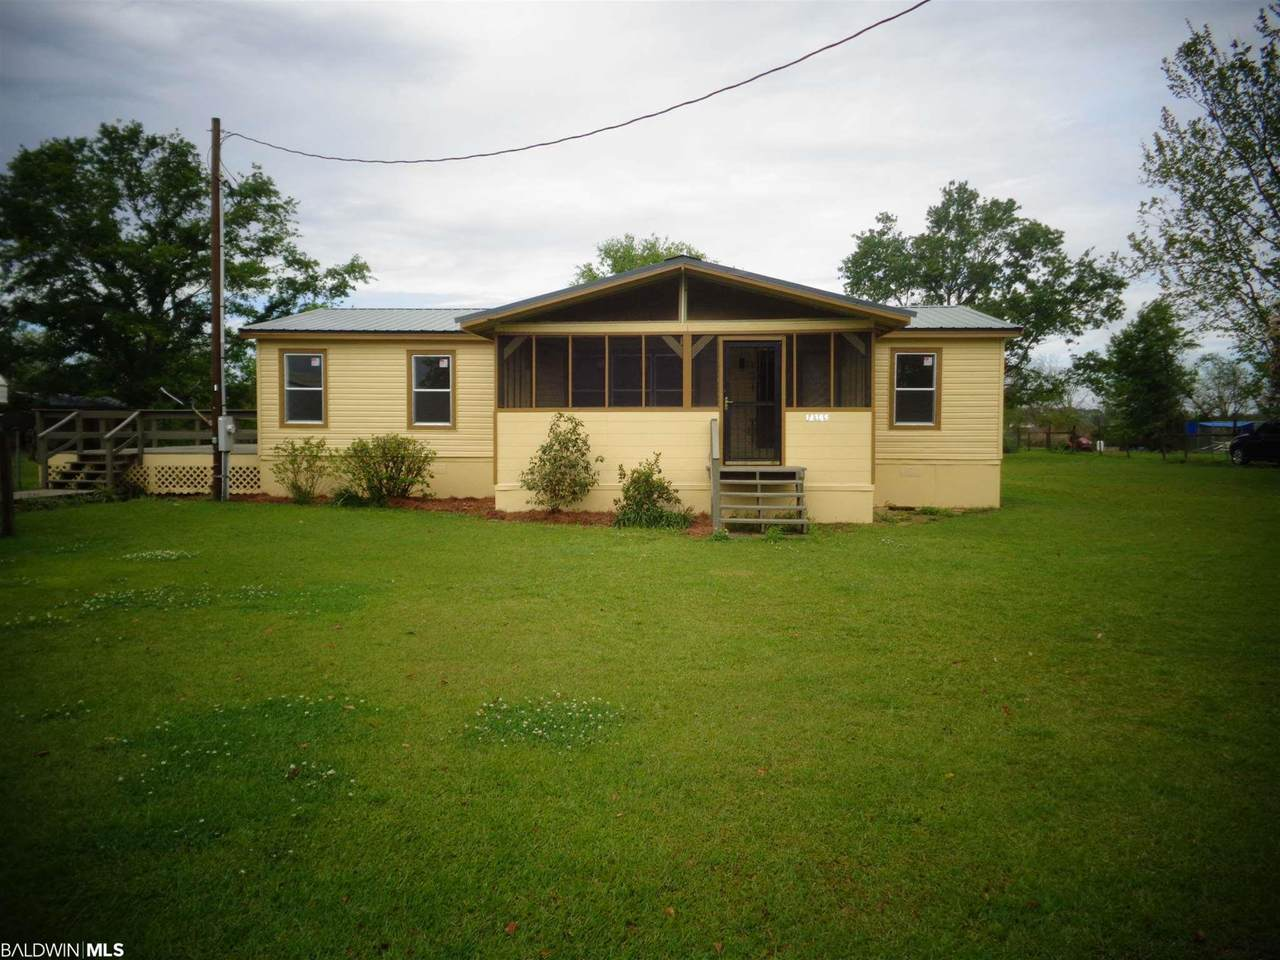 14385 Homestead Ln - Photo 1